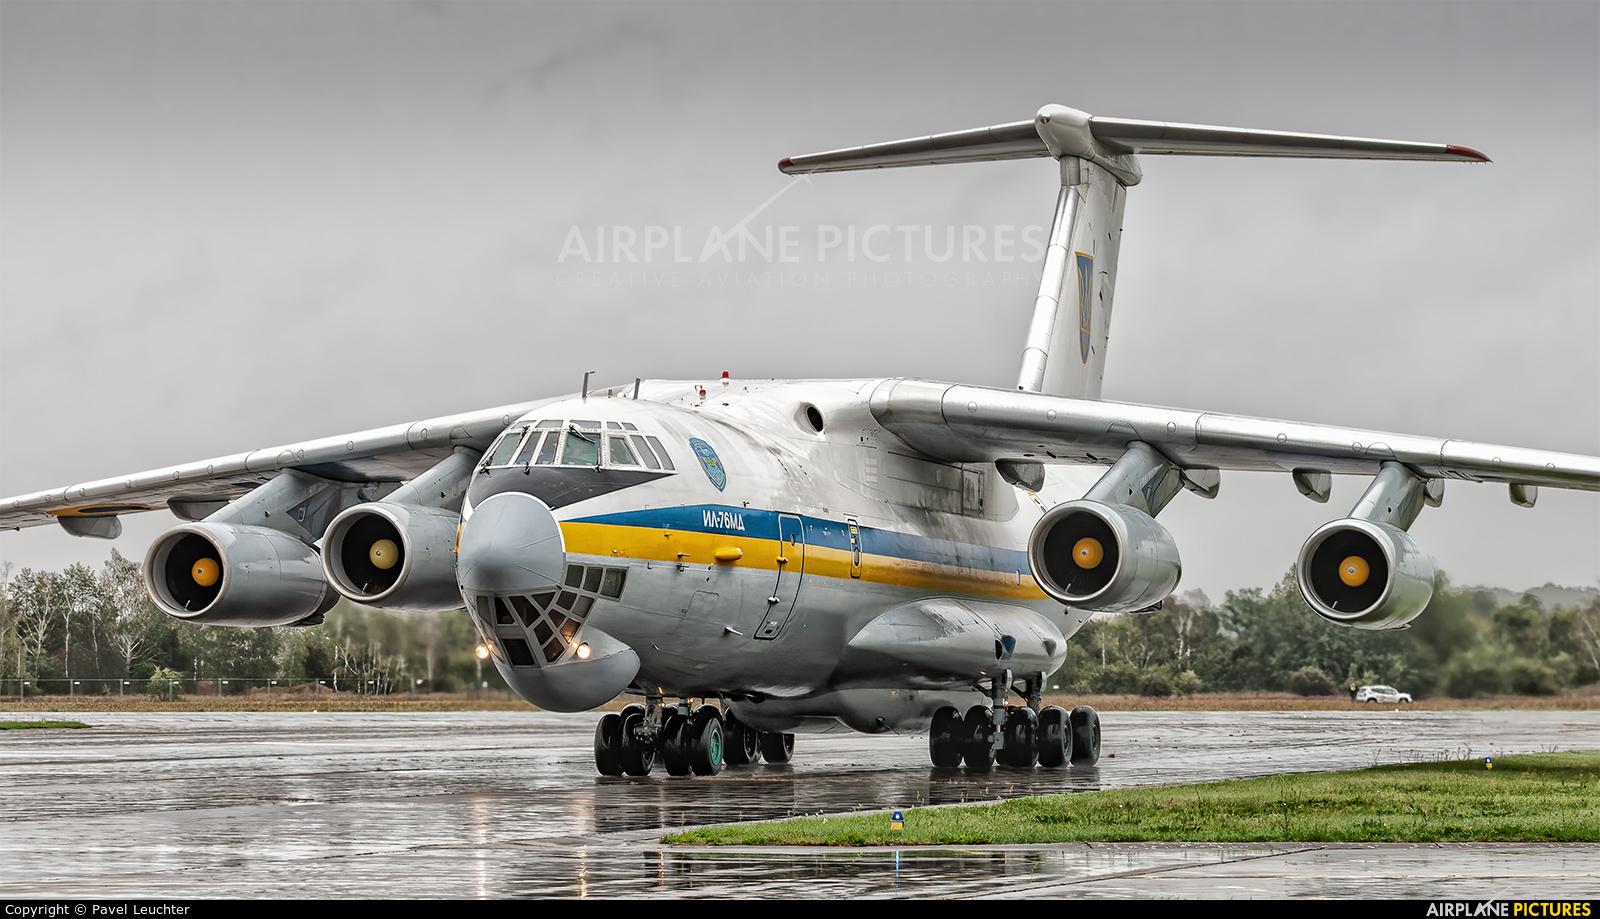 Ukraine - Air Force 76413 aircraft at Hradec Králové